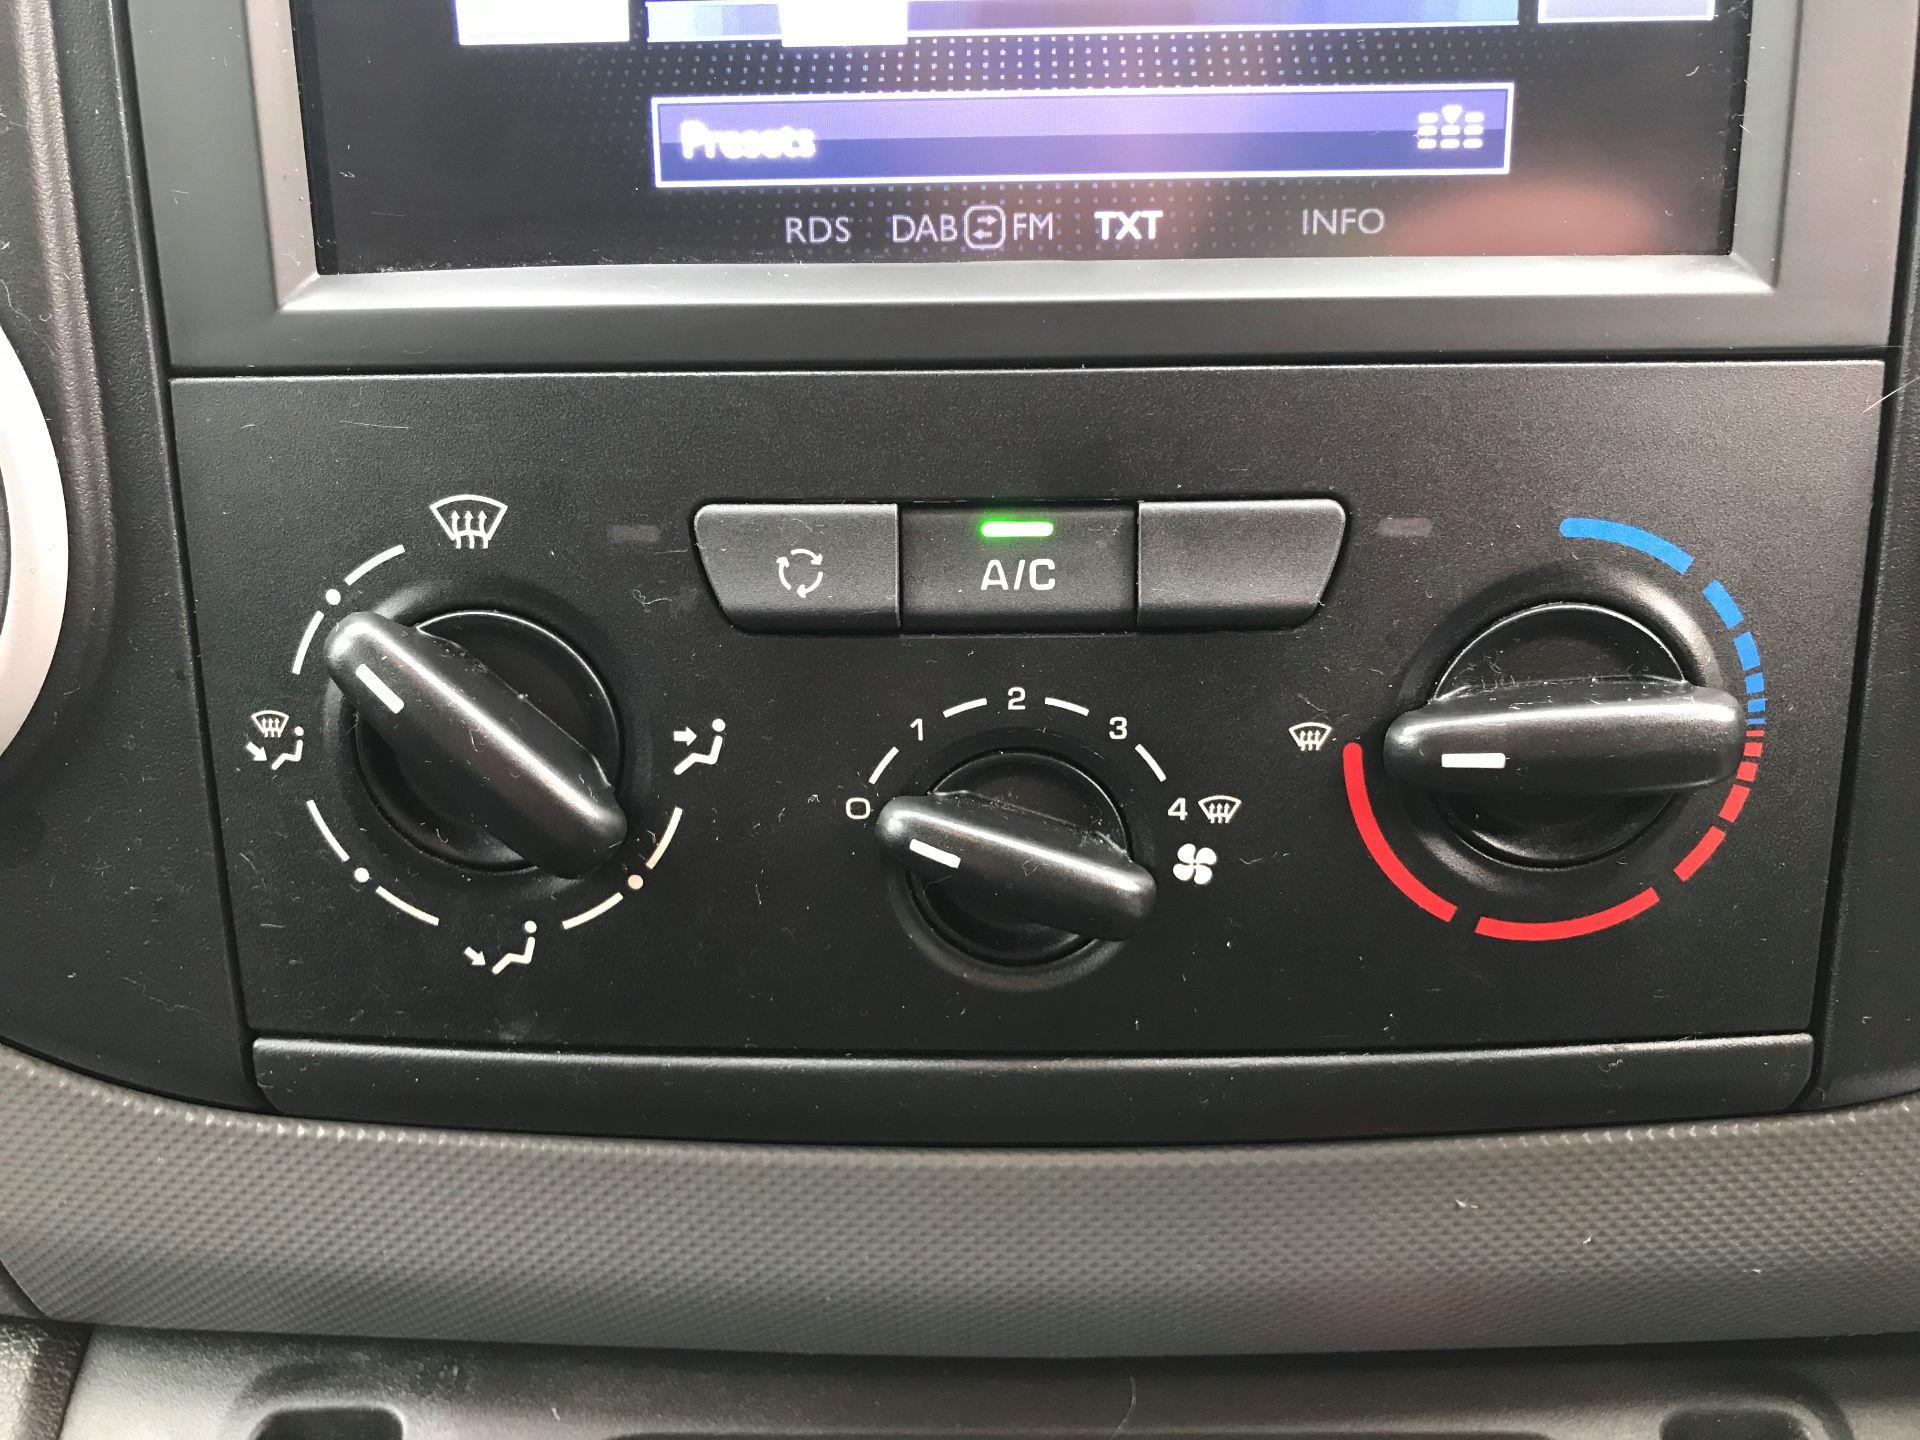 2018 Peugeot Partner L1 850 1.6 BLUEHDI 100 PROFESSIONAL (NON S/S)EURO 6 (NU18DJY) Image 24